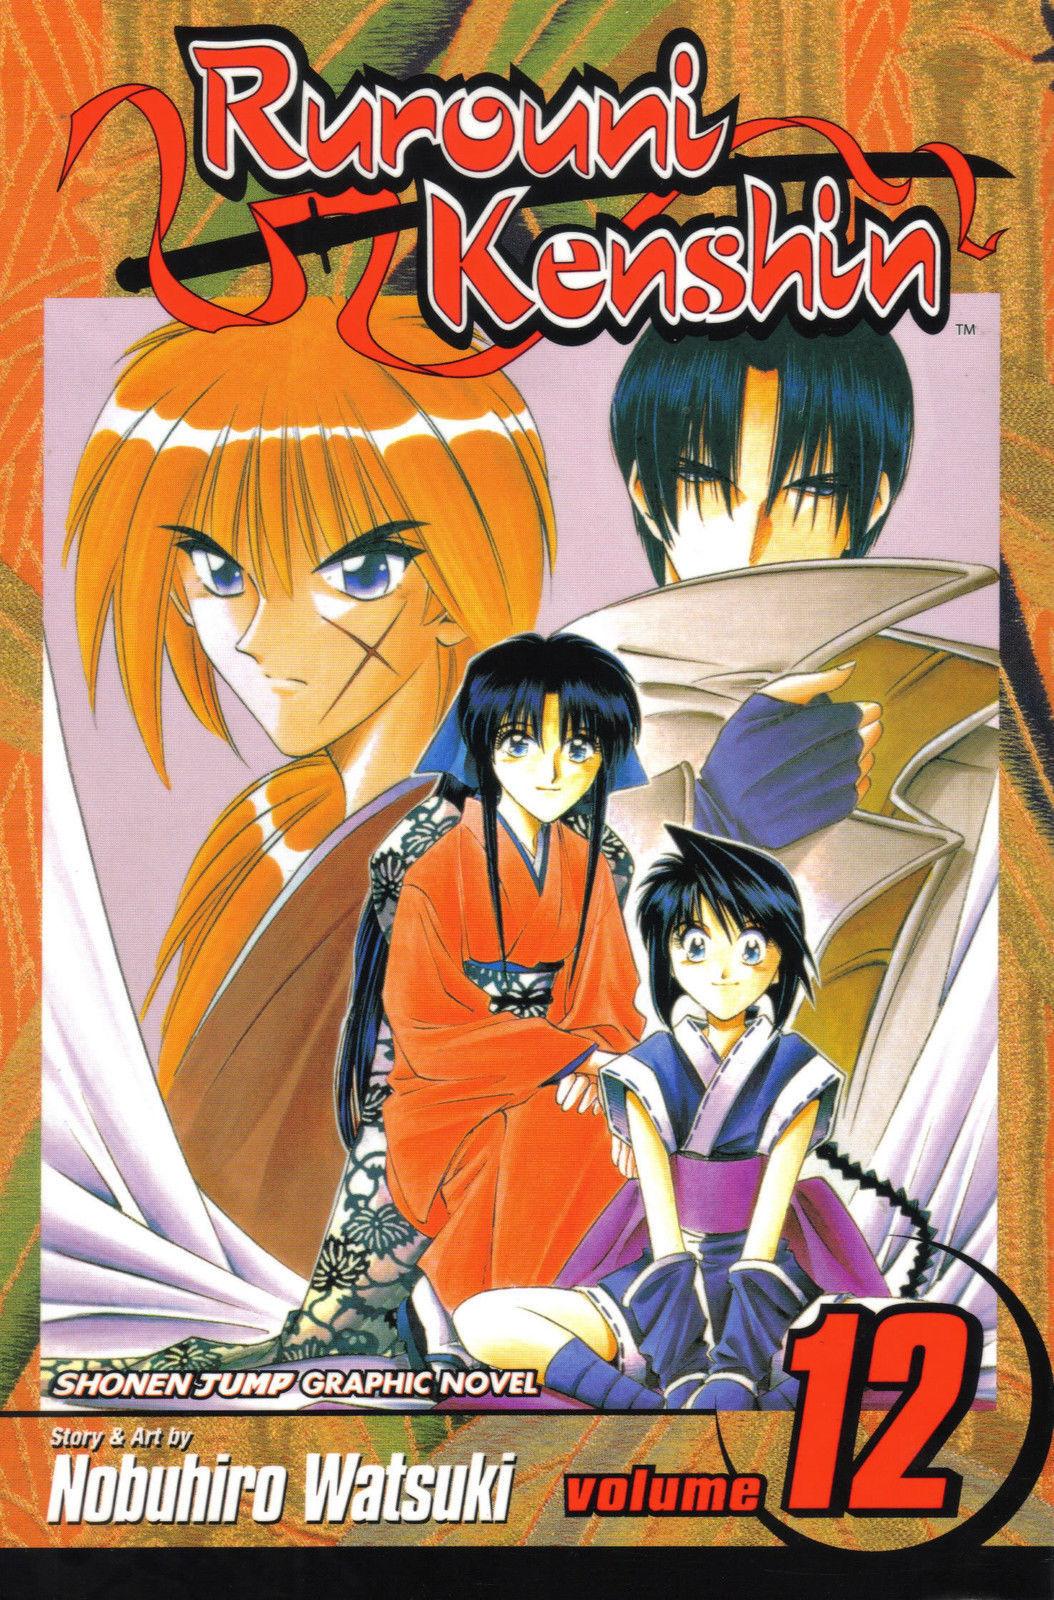 Rurouni Kenshin Vol. 12 (Viz) ~ Shonen Jump